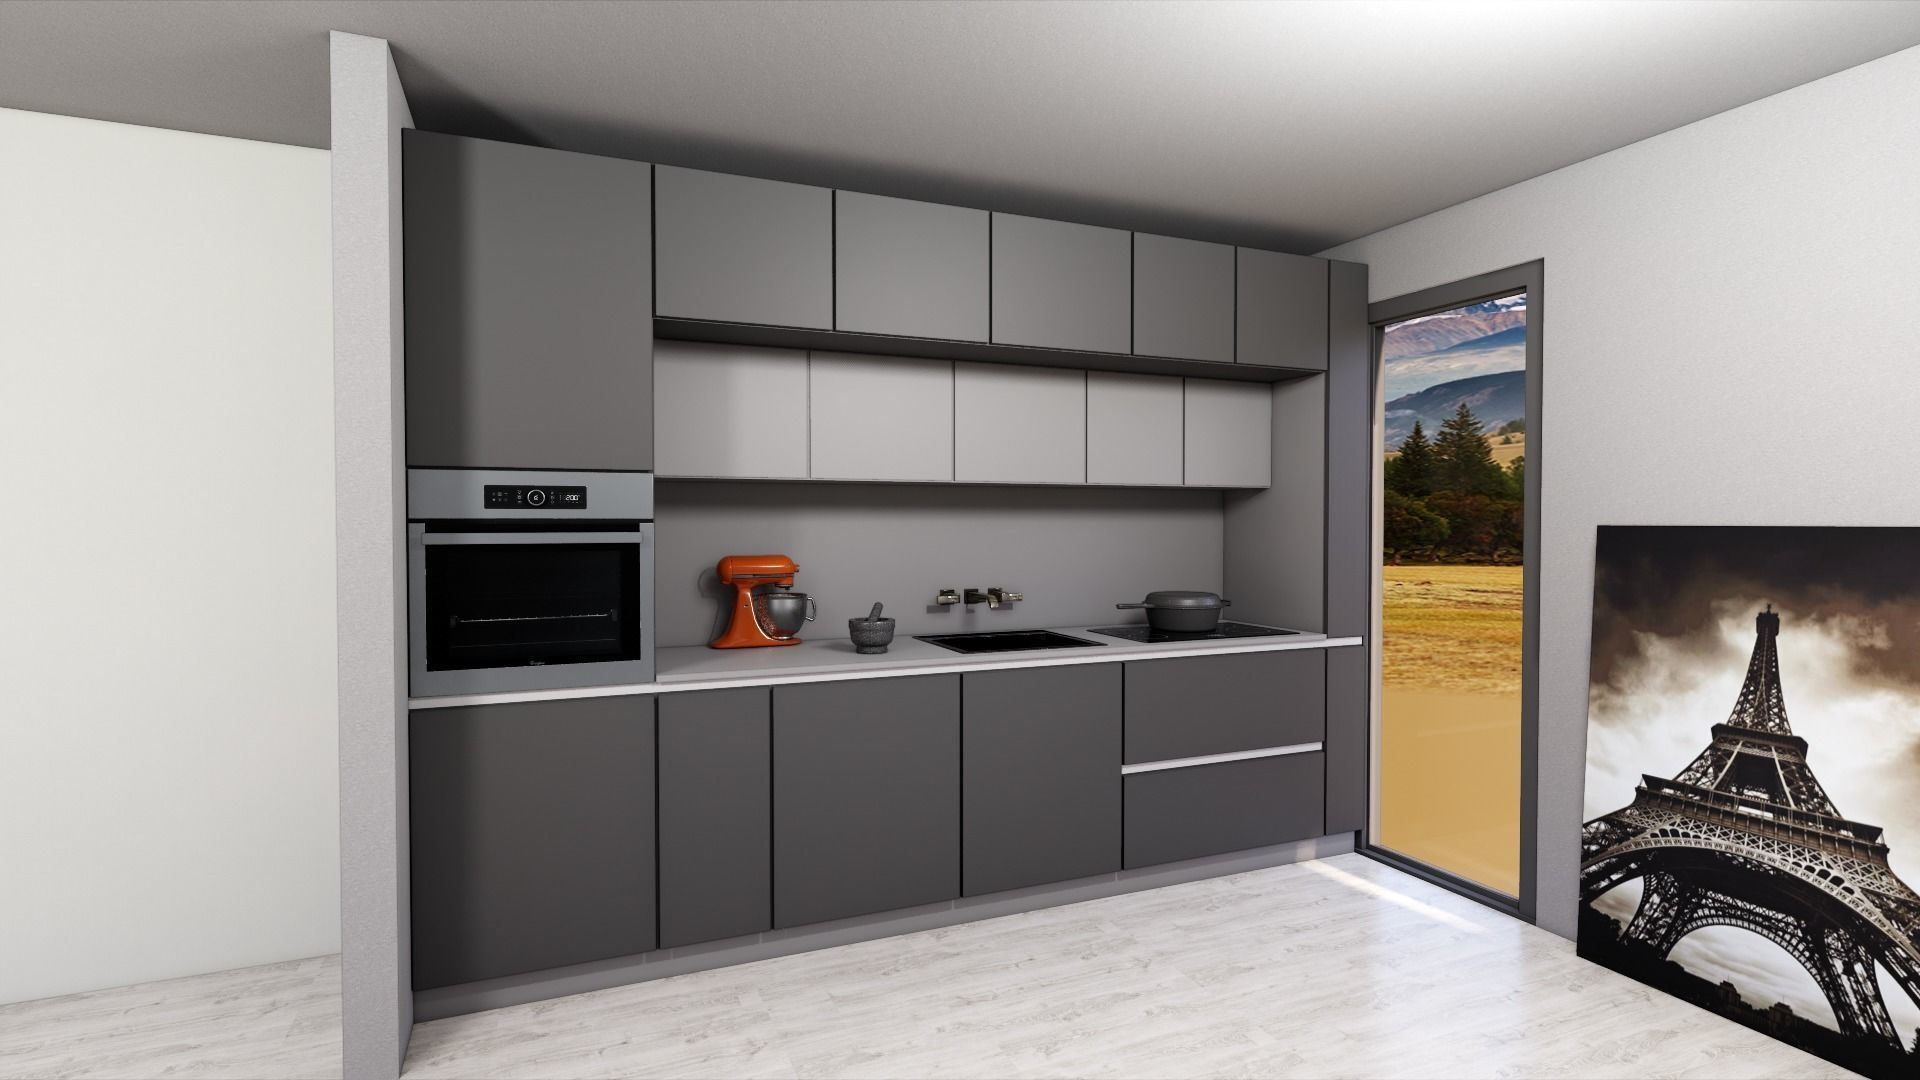 modern kitchen with island 3D model in 2020 Modern